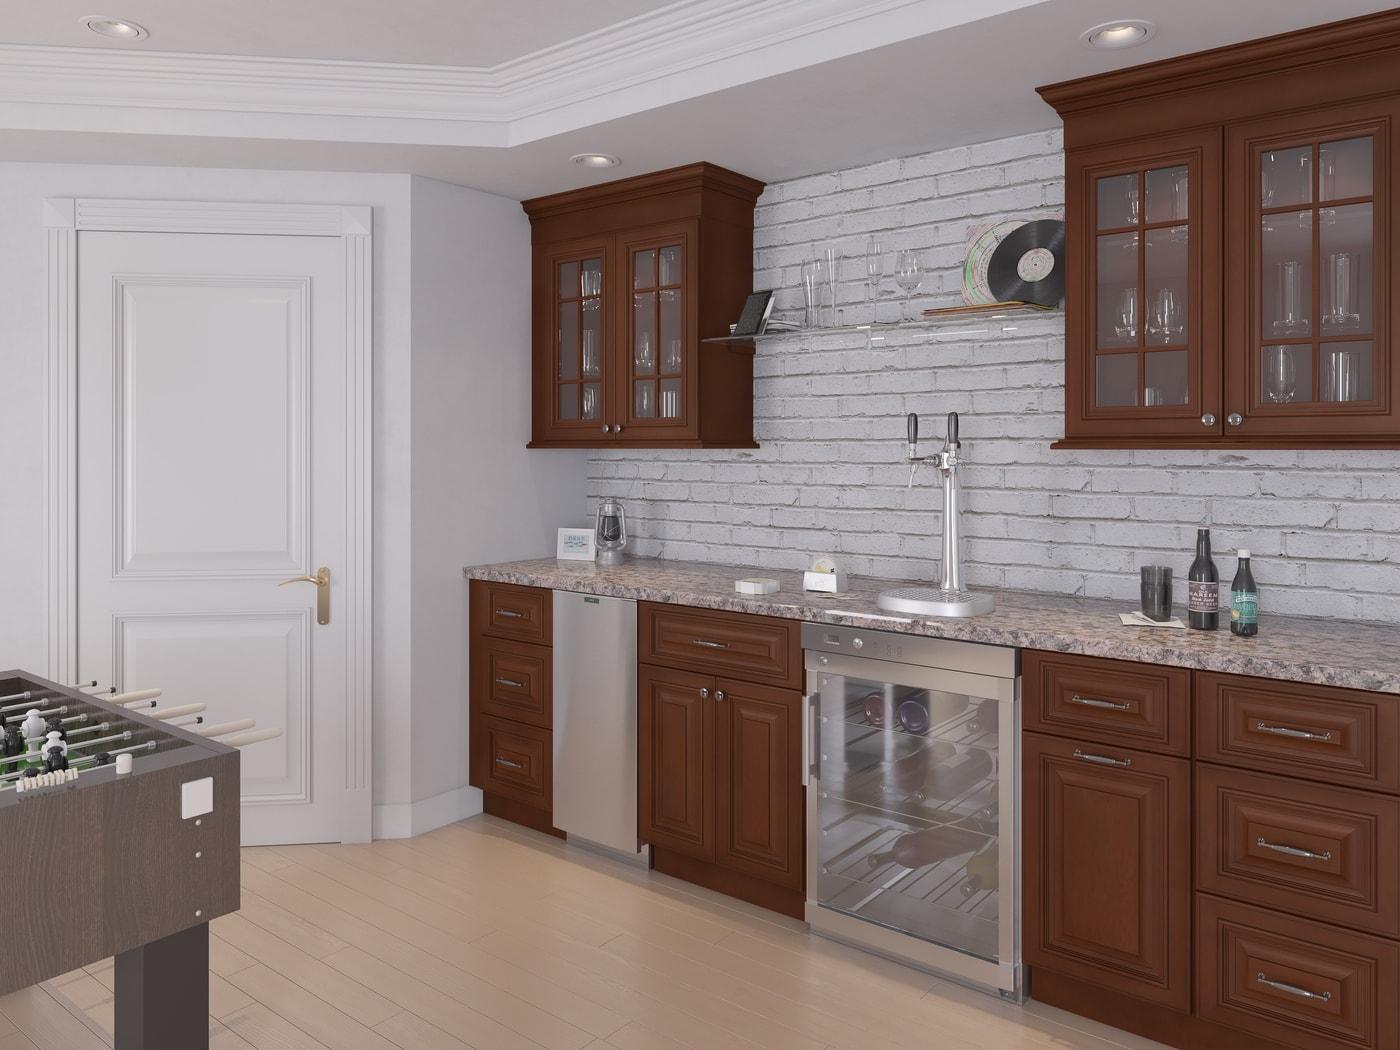 Cabinet Components Construction Features